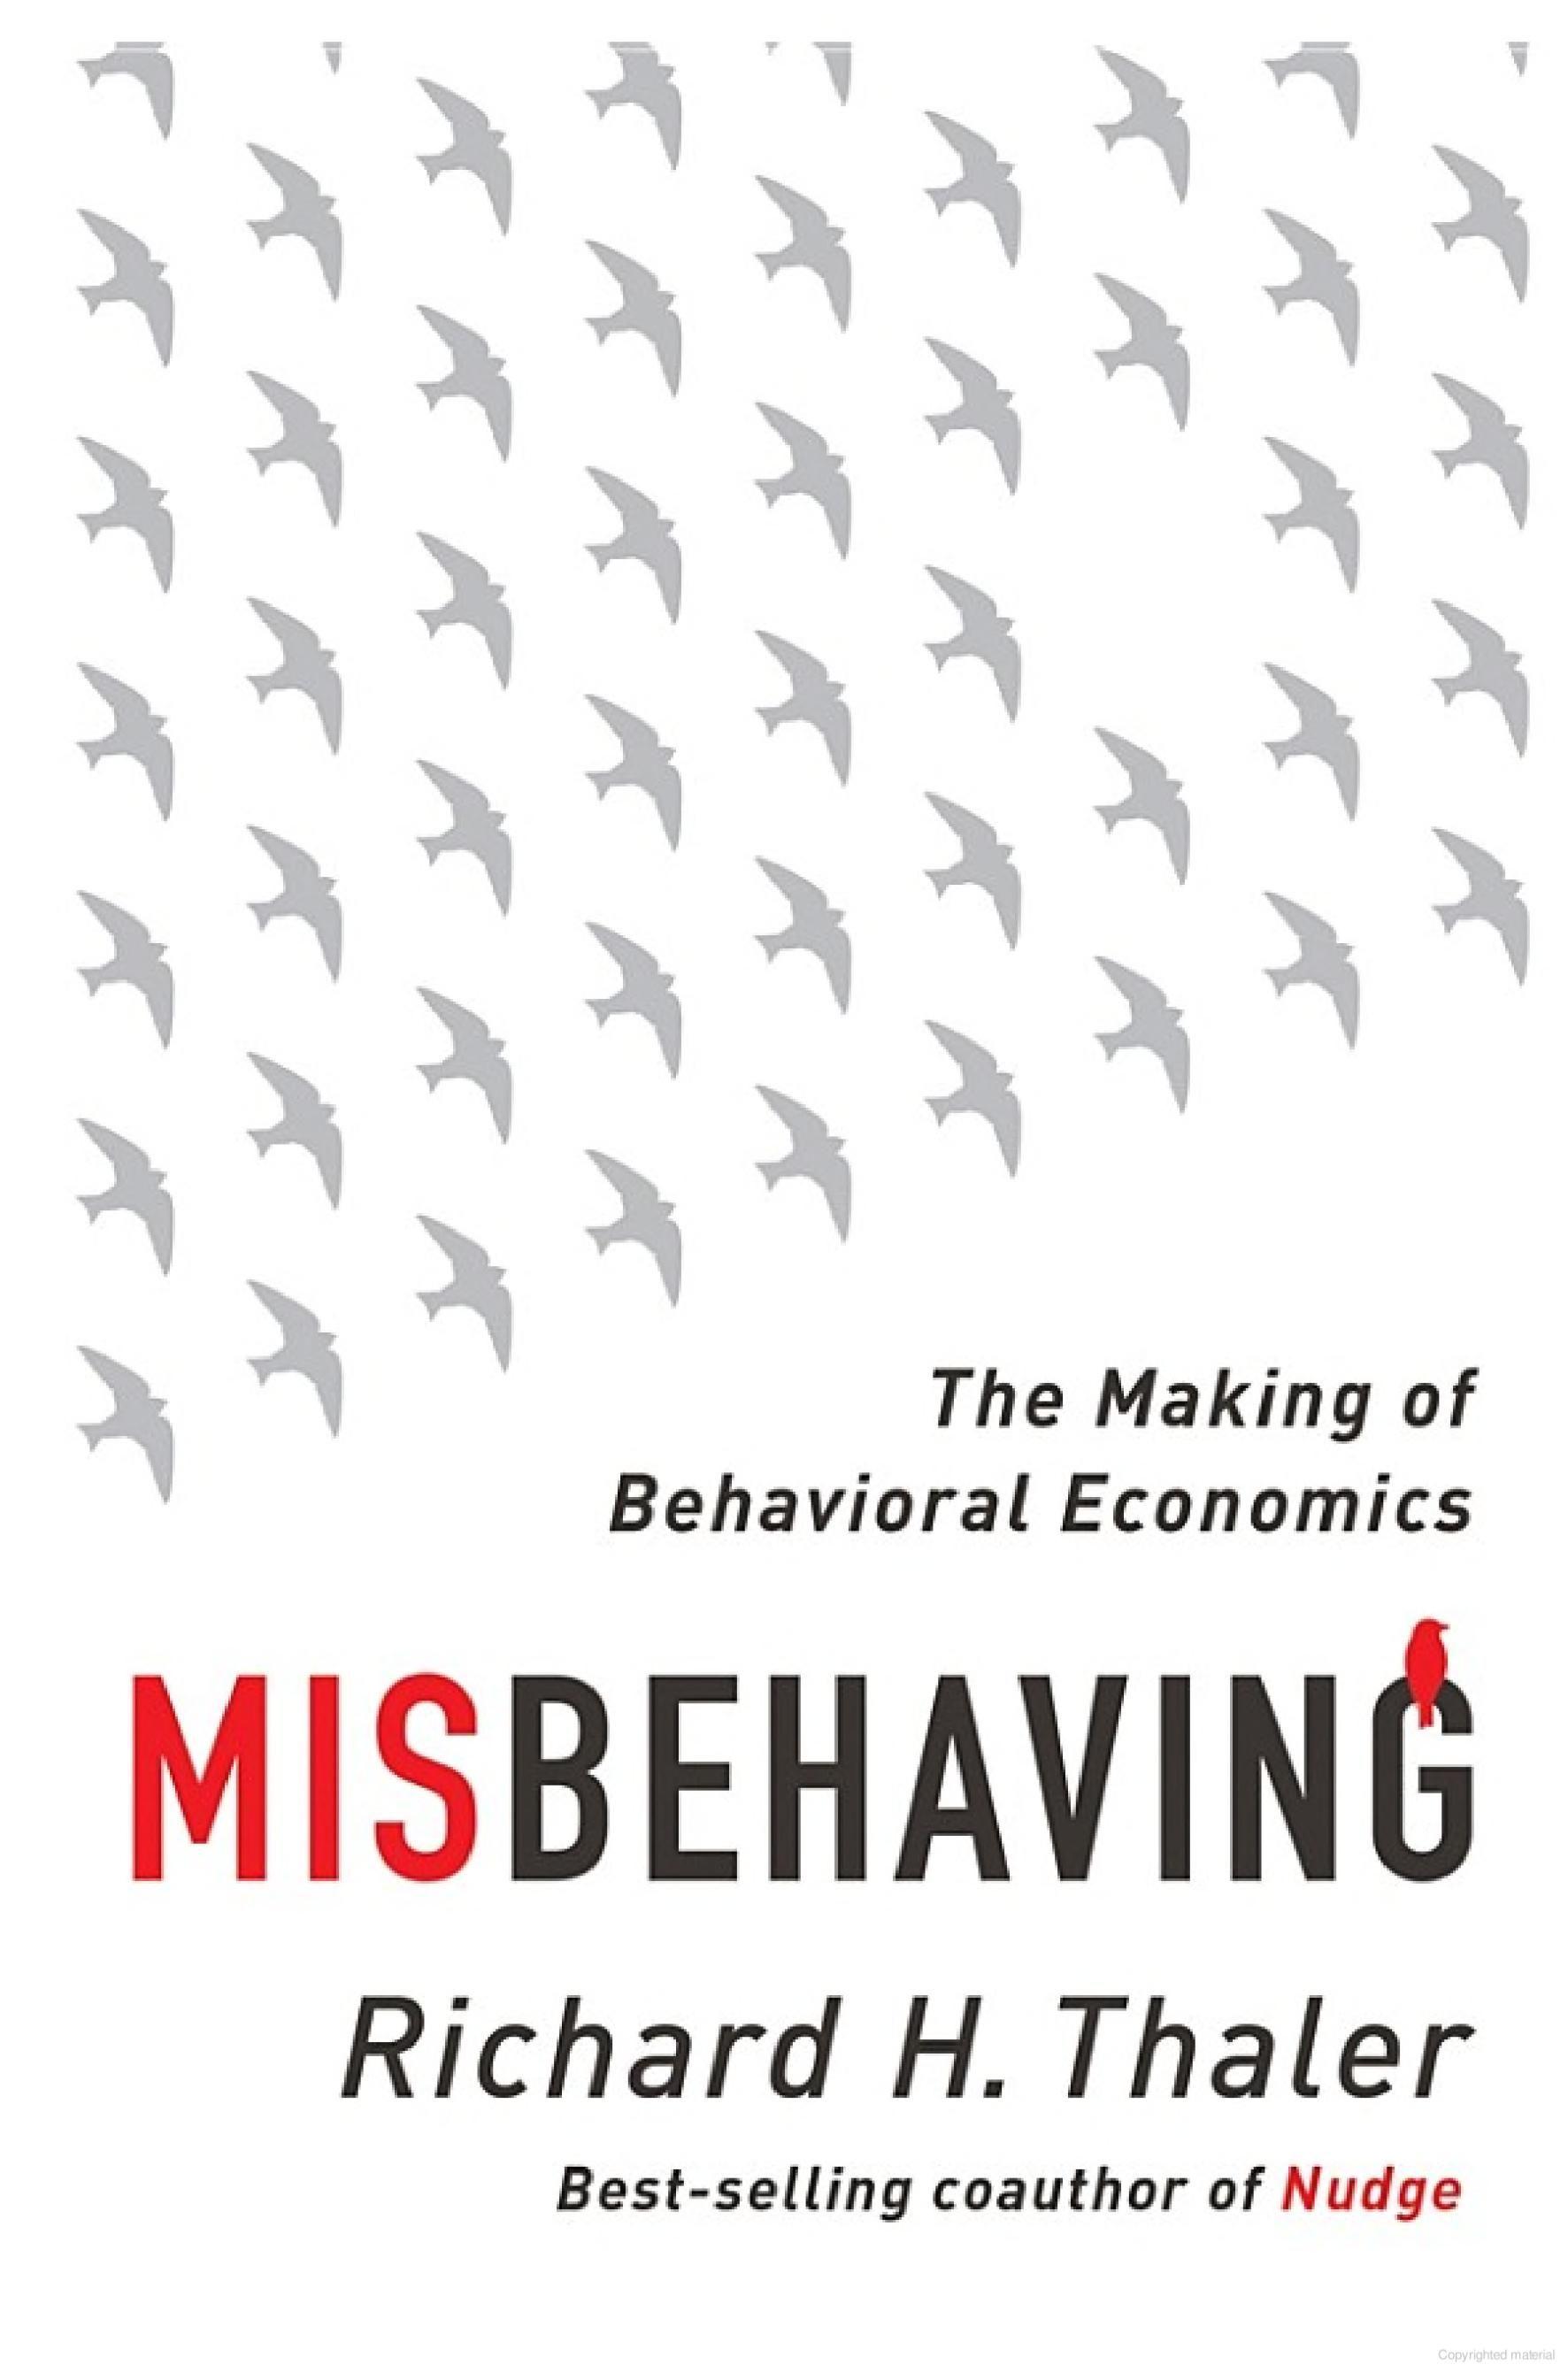 Misbehaving: The Making of Behavioral Economics - Richard H. Thaler - Google Books